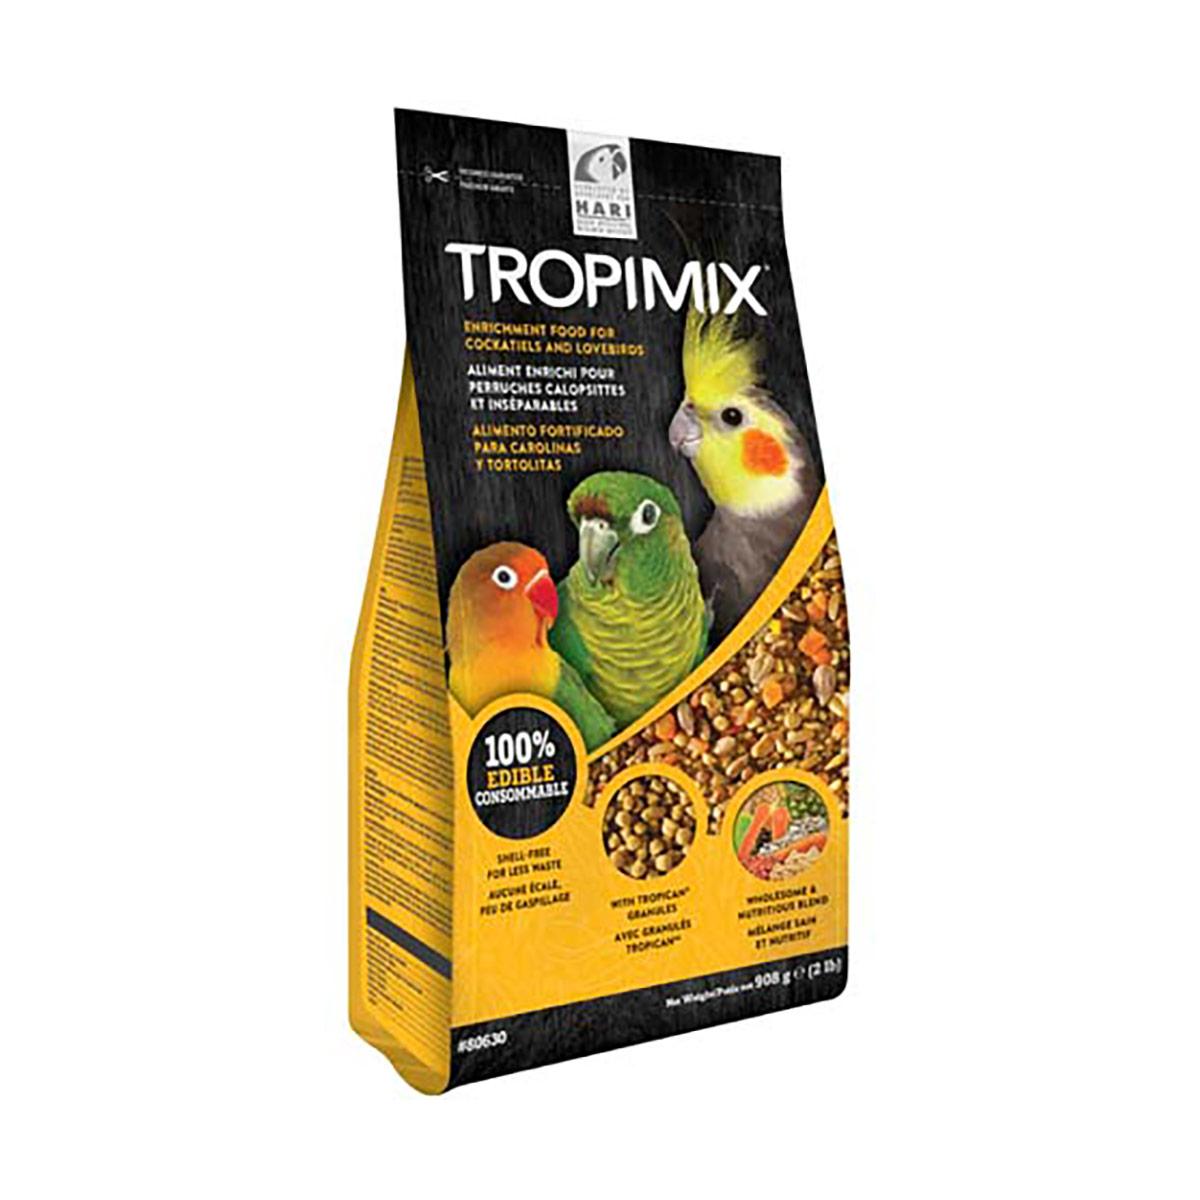 Image of Hari Tropimix Cockatiels and Lovebirds : 908 gr